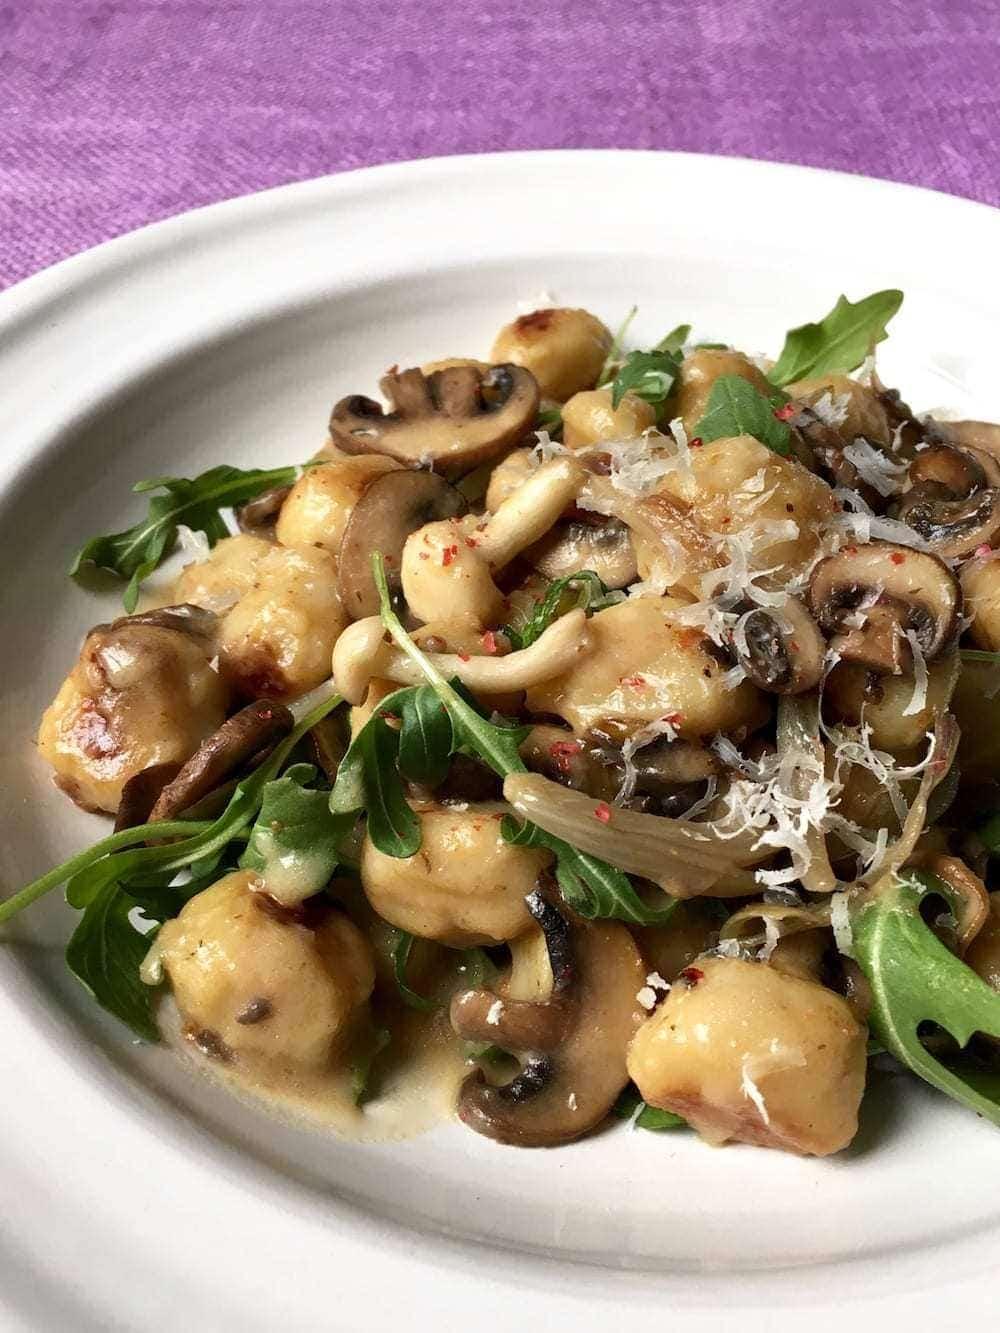 Mushroom Gnocchi in a creamy white wine sauce